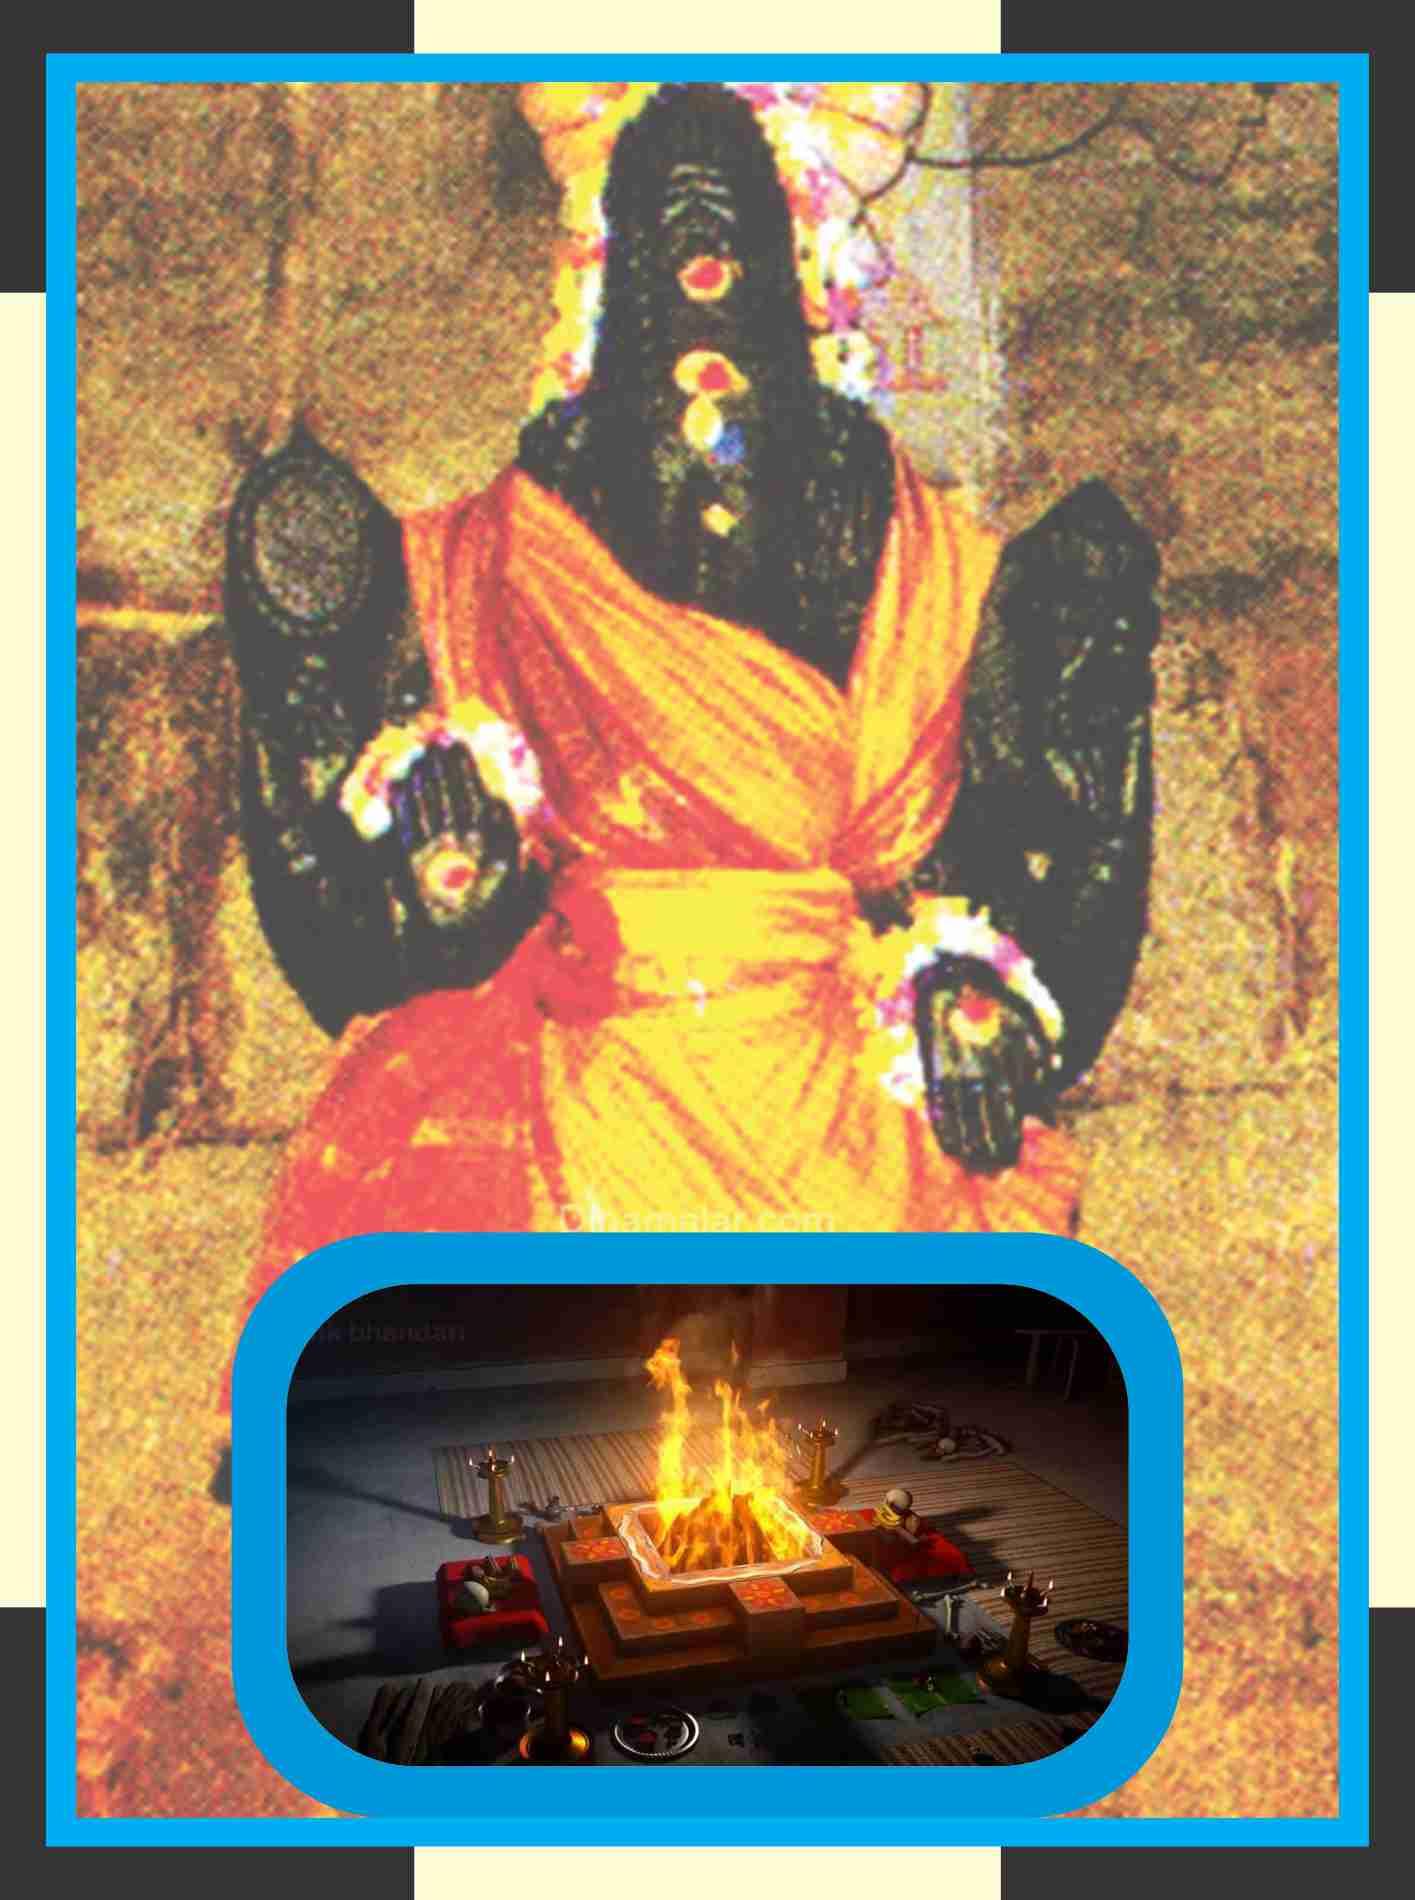 Kamarasavalli - Karkodeswarar Temple Homam for Kataka Rasi